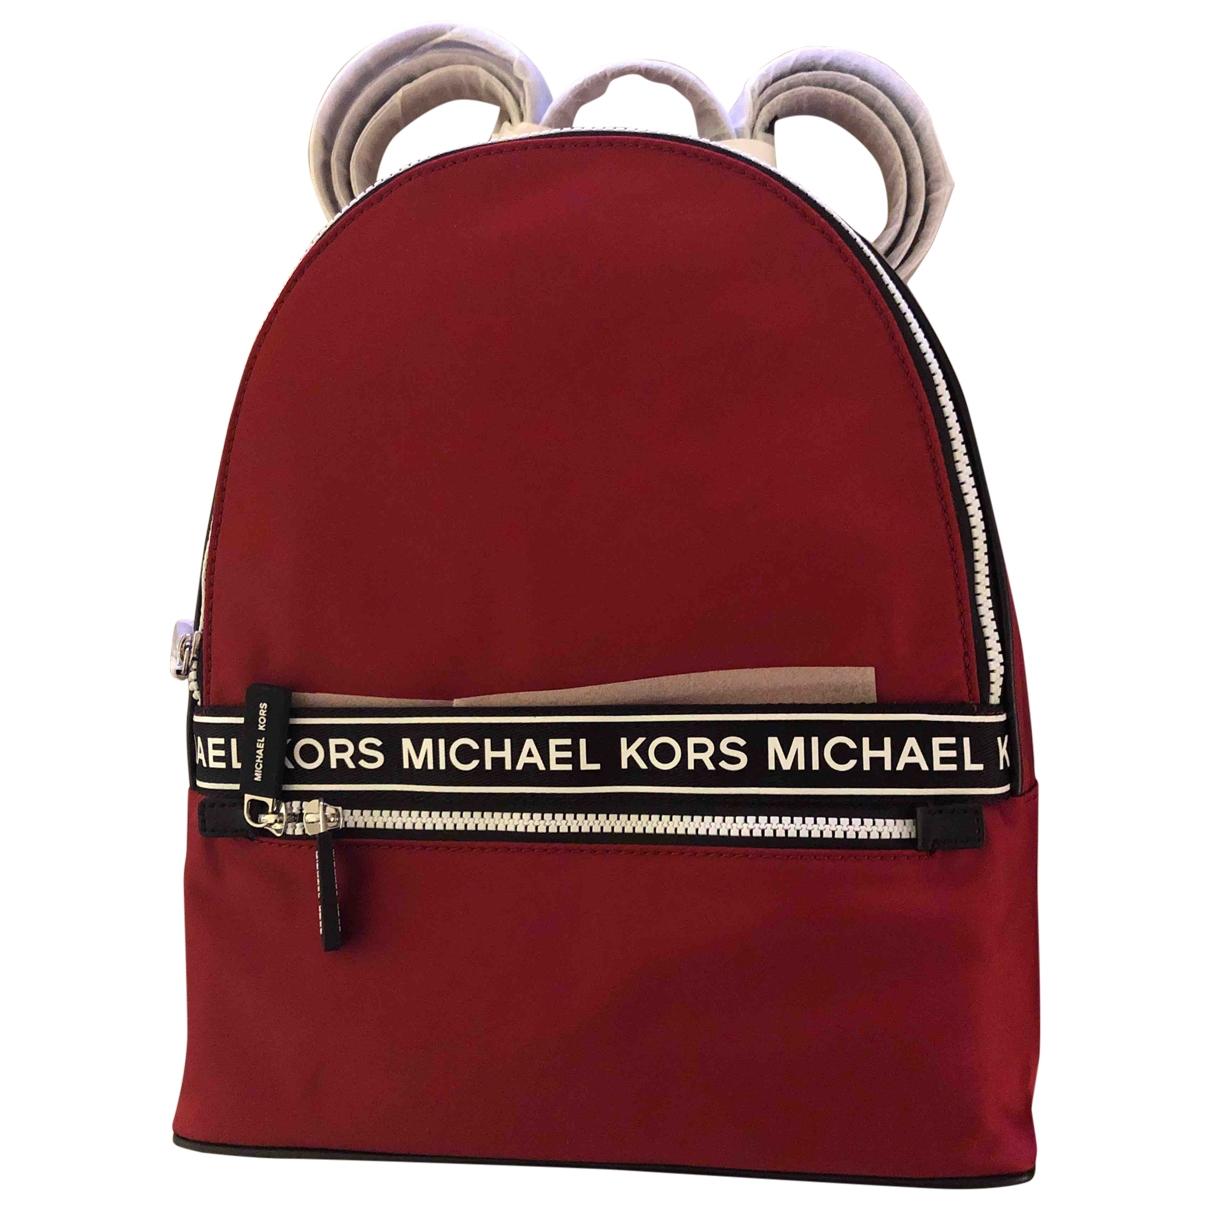 Michael Kors \N Rucksaecke in  Rot Polyester